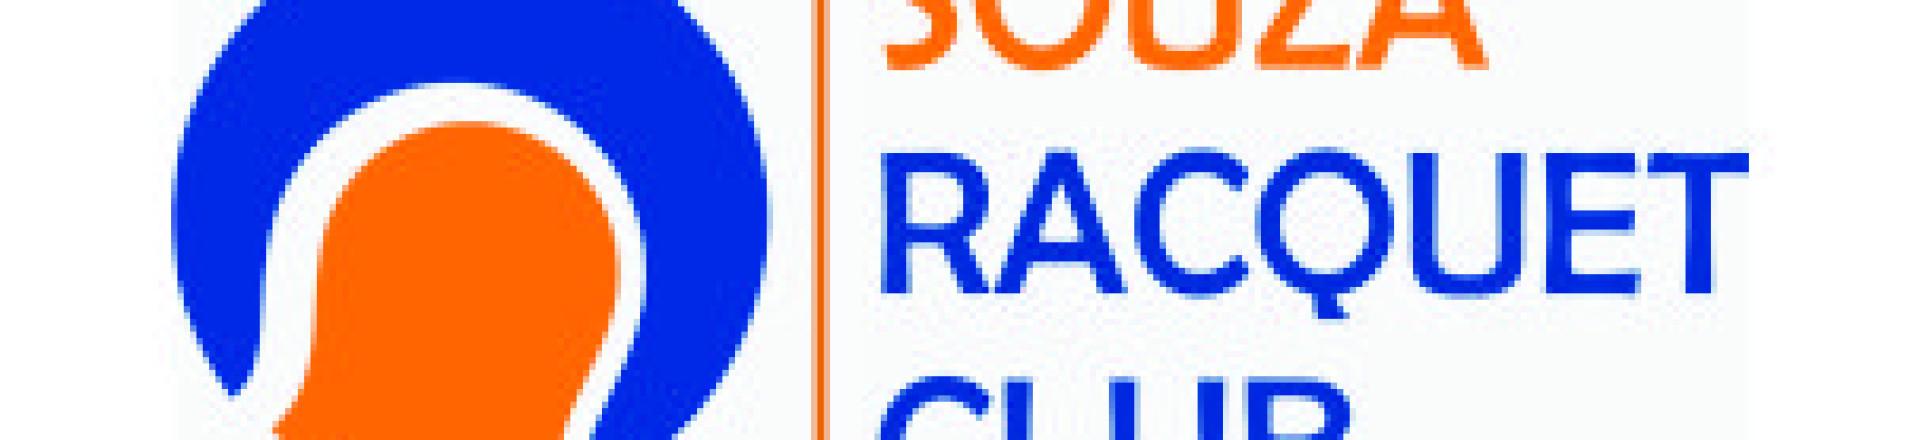 Souza Racquet Club